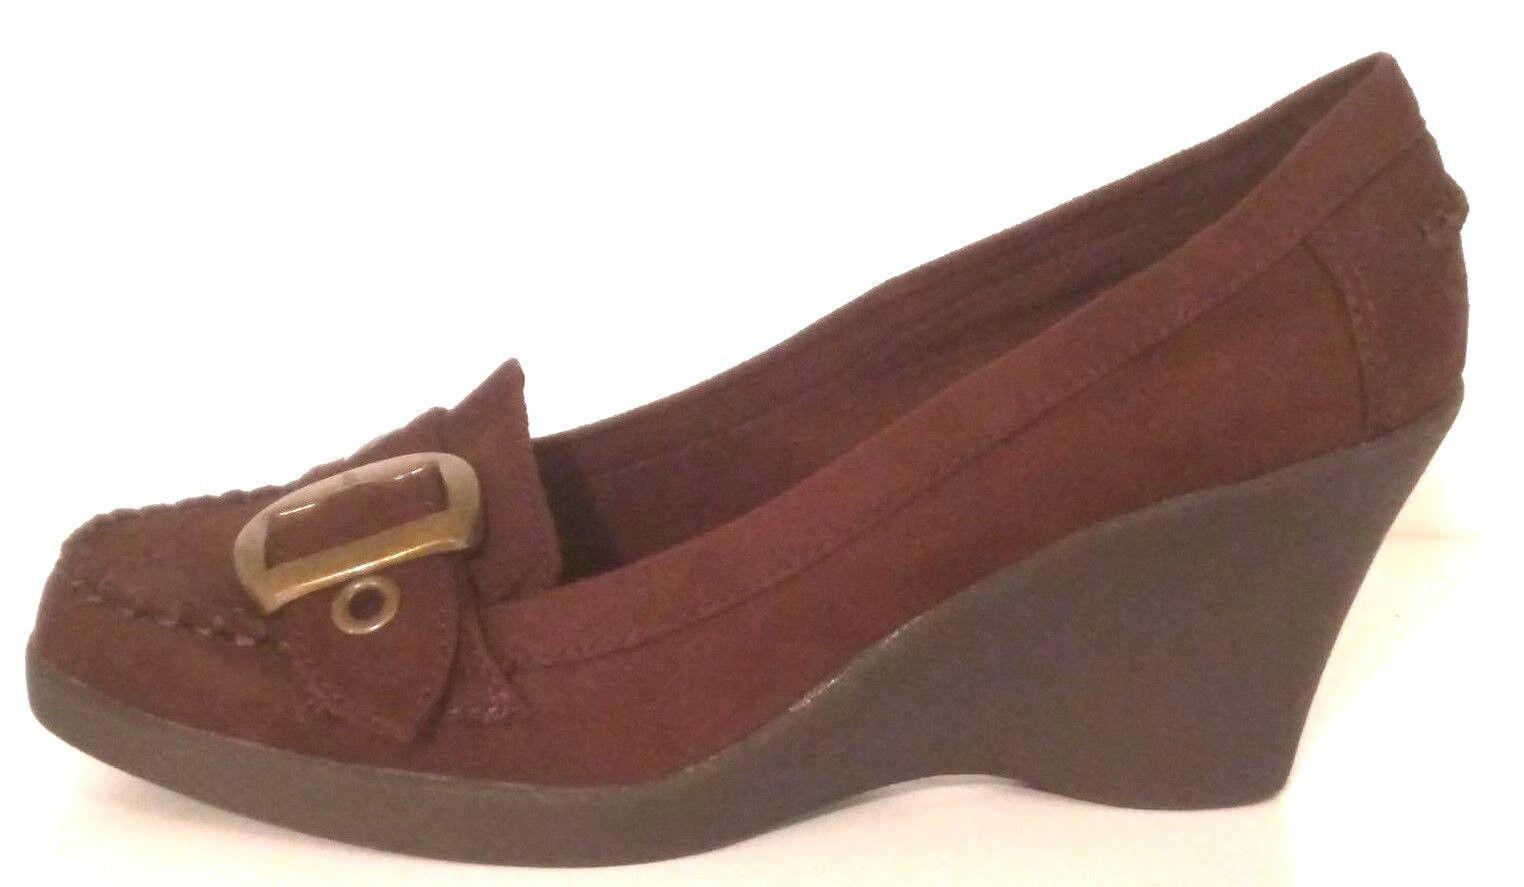 AMERICAN EAGLE 65095 - Women's Wedge Heel Suede Oxfords - Size  7